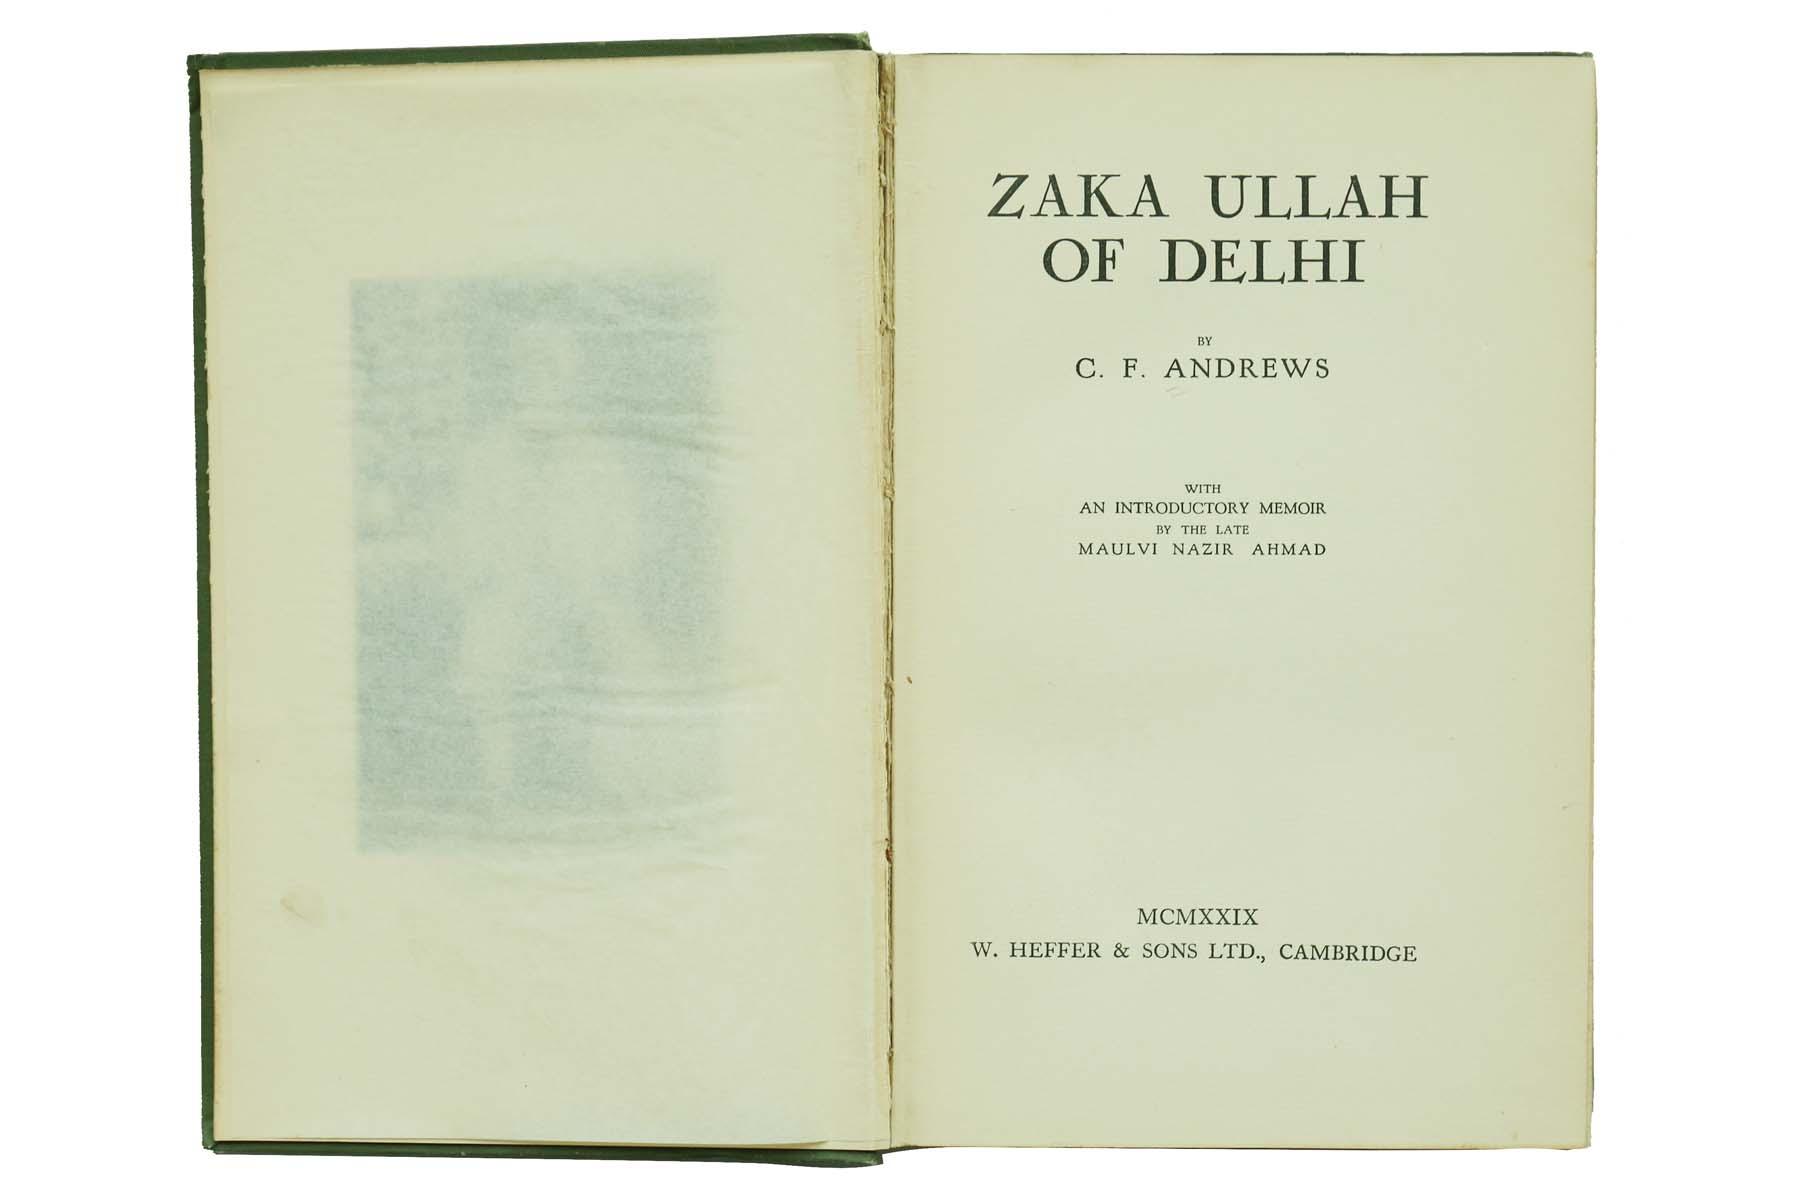 ZAKA ULLAH OF DELHI